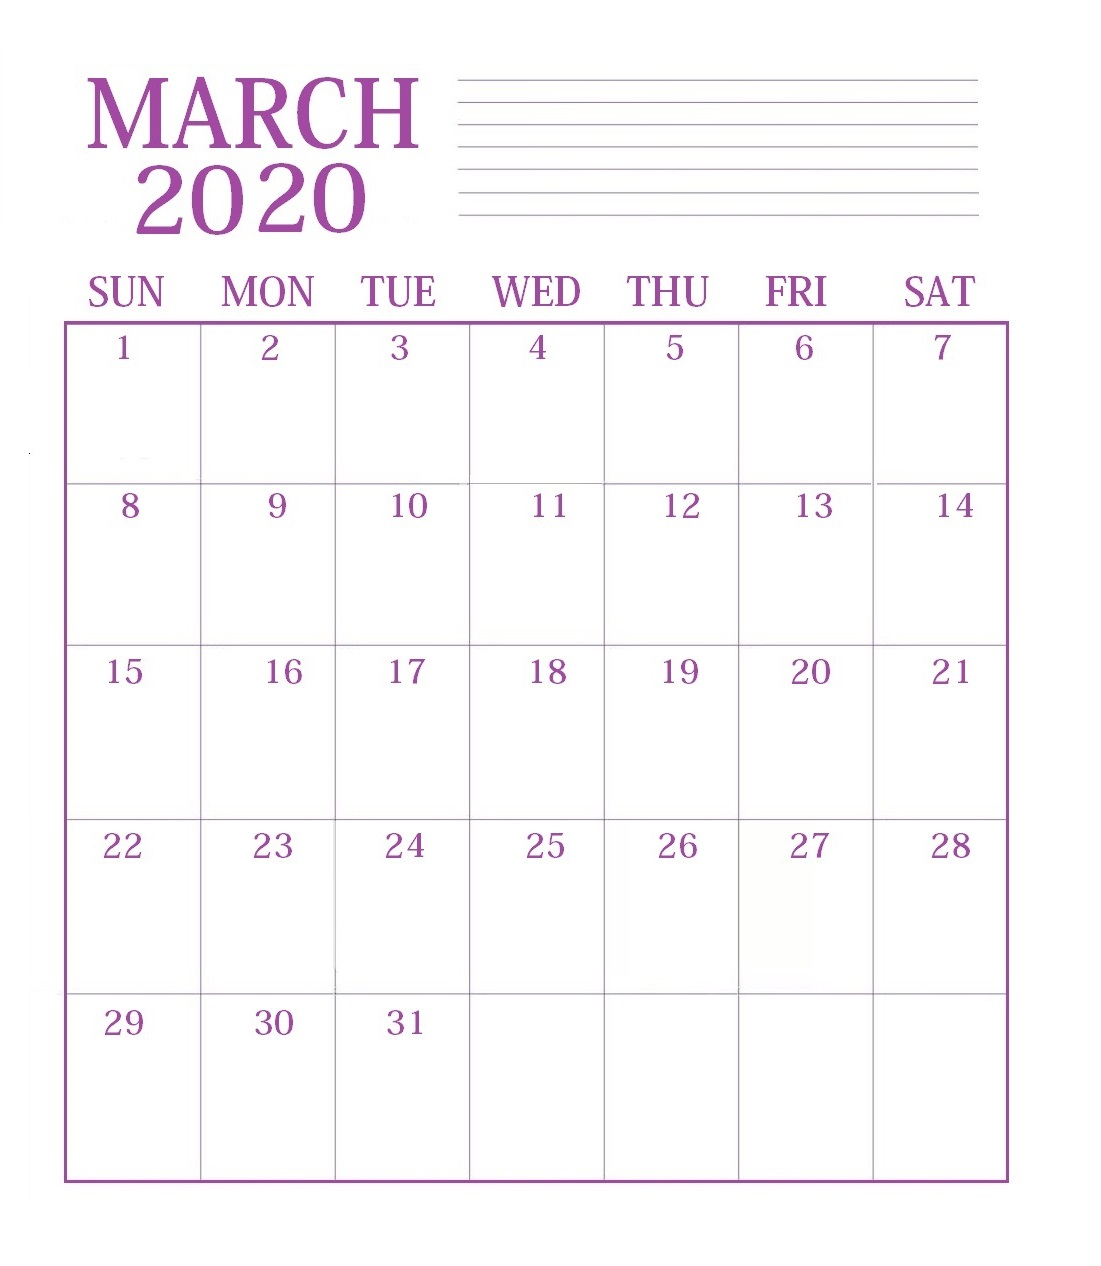 Print March 2020 Desk Calendar